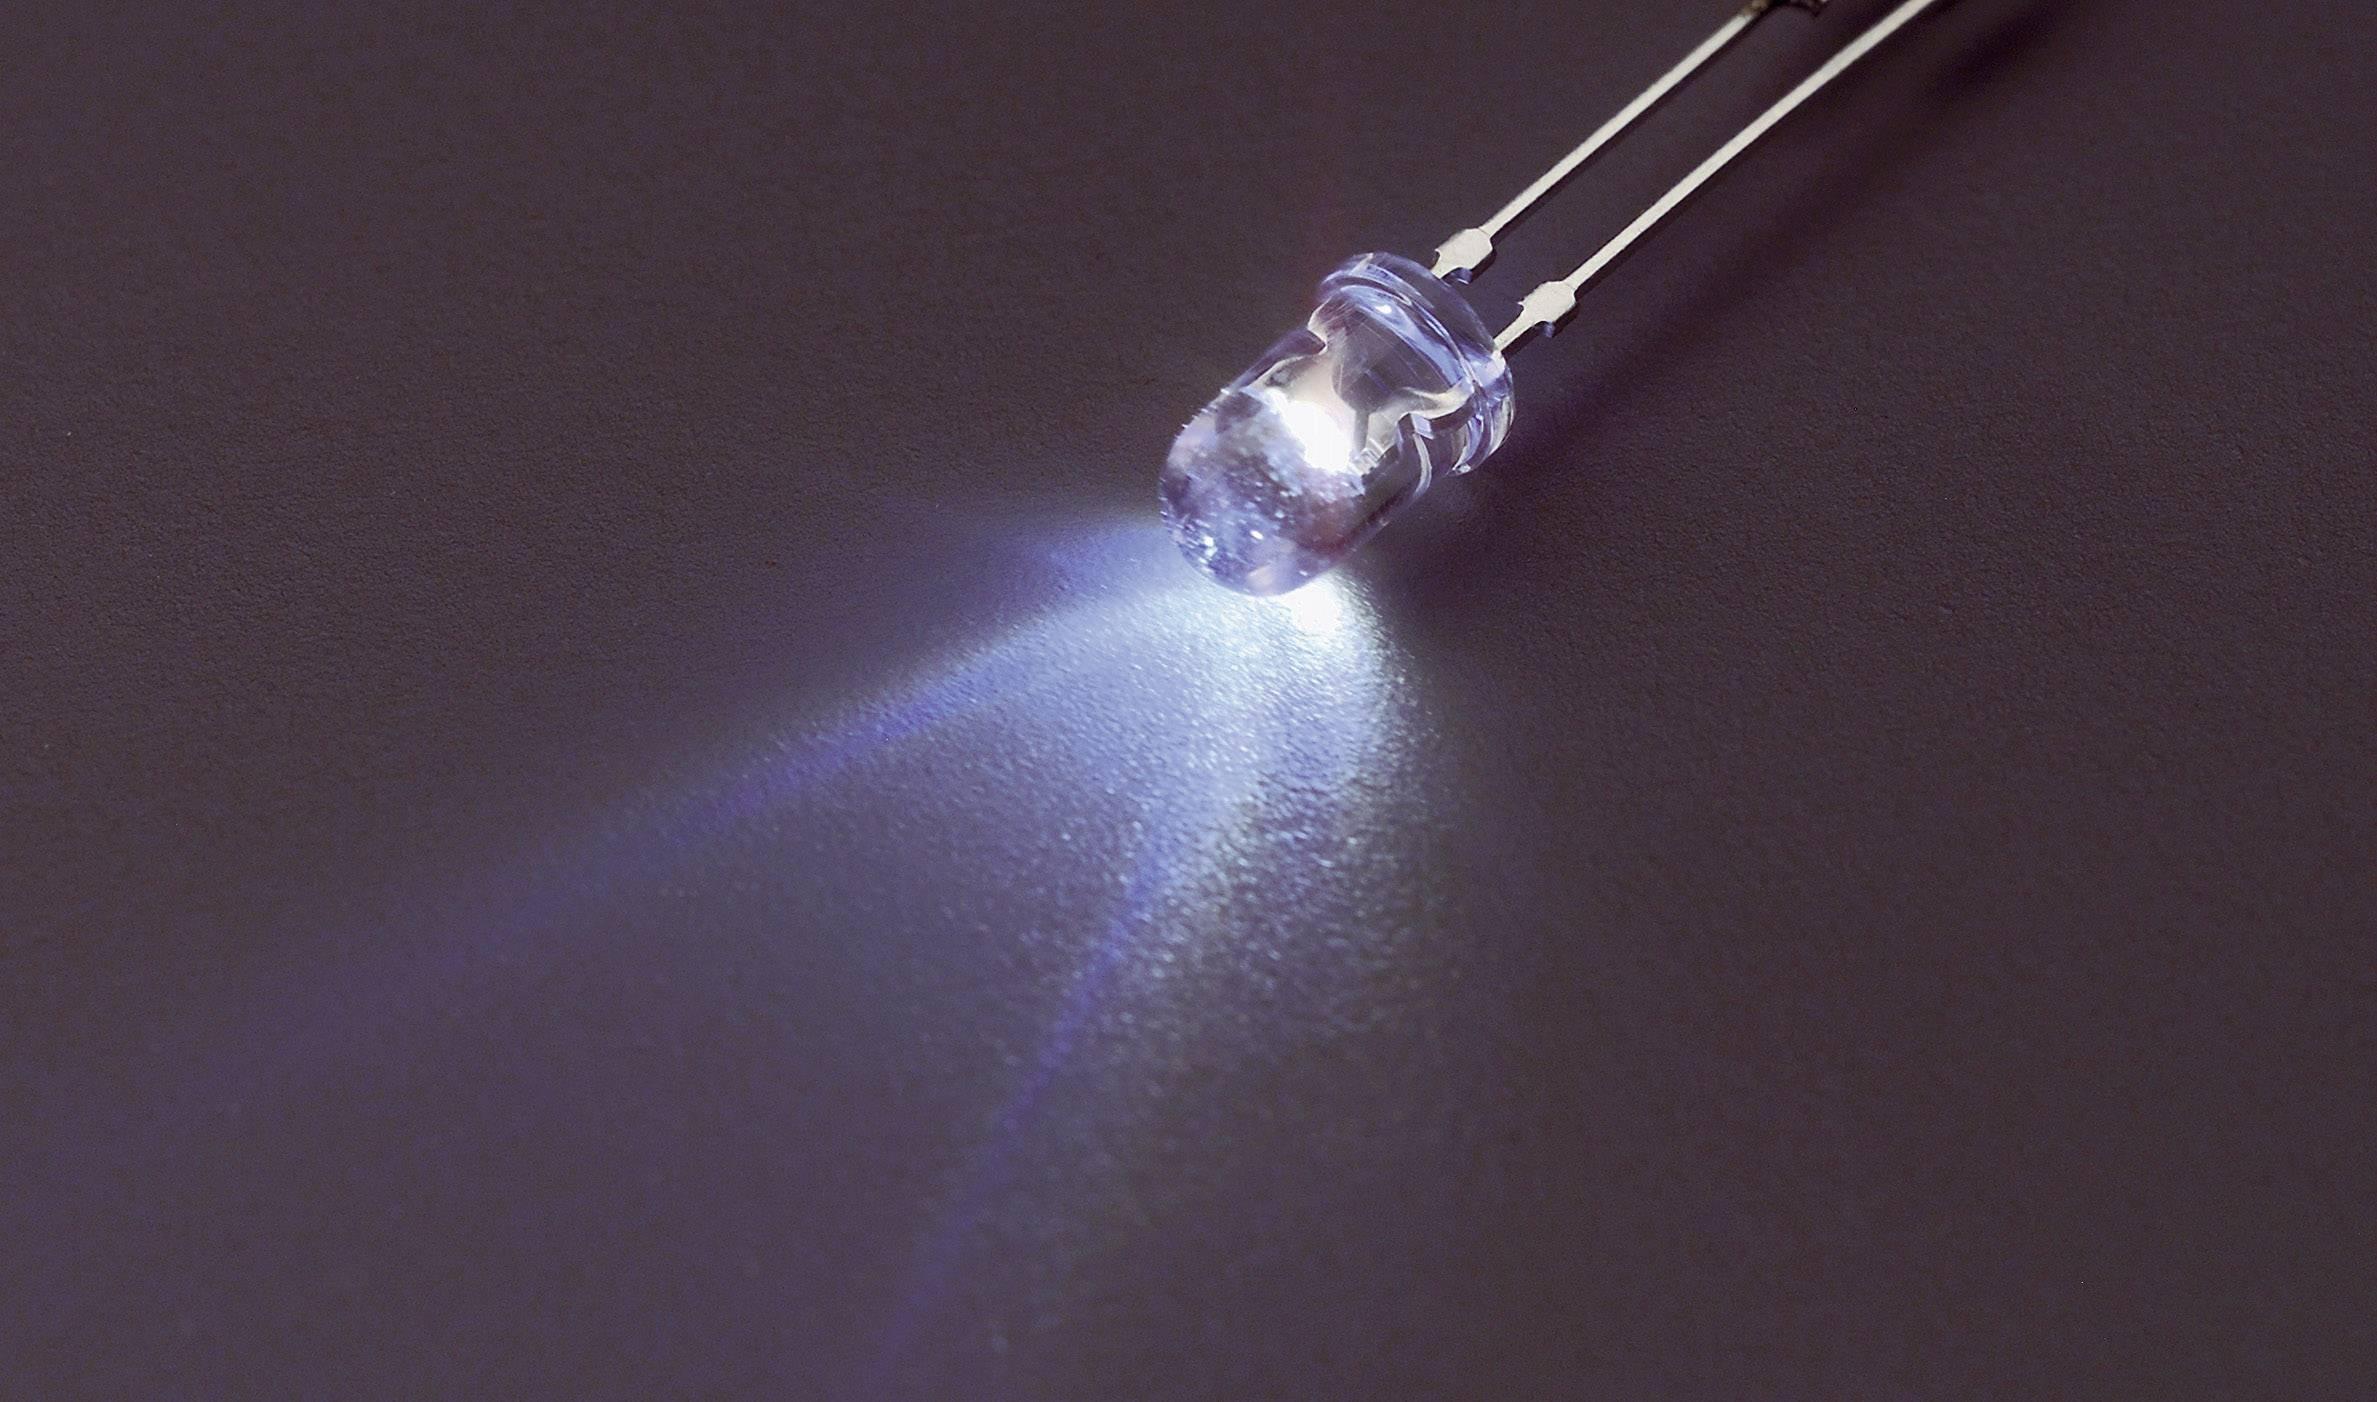 LED dioda Nichia NSPW515DS, kulatá, 20 mA, 5 mm, 3,2 V, 65 °, 2300 mcd